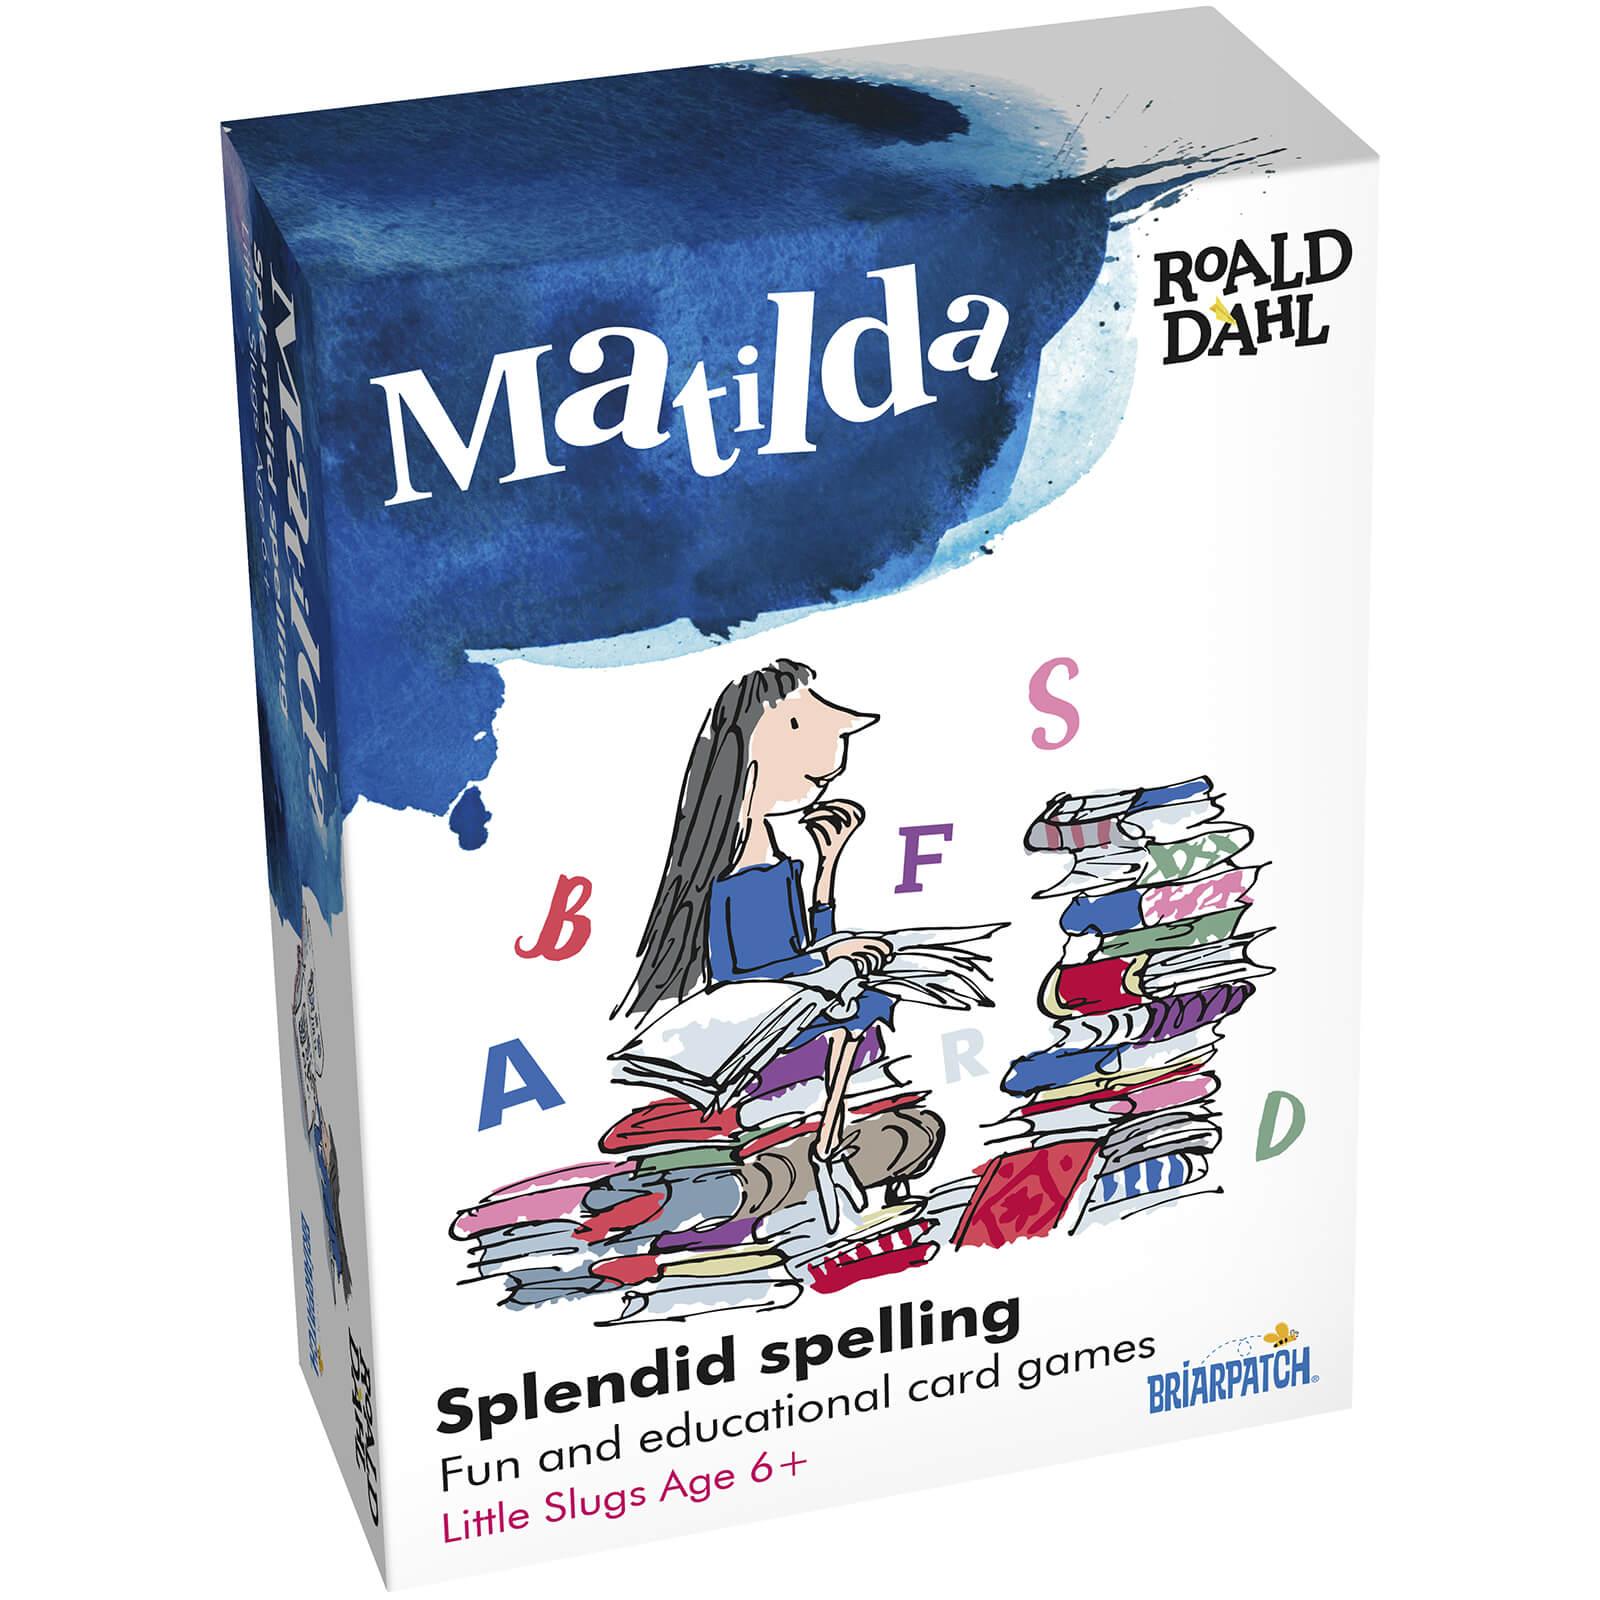 Image of Roald Dahl Matilda Word Educational Games